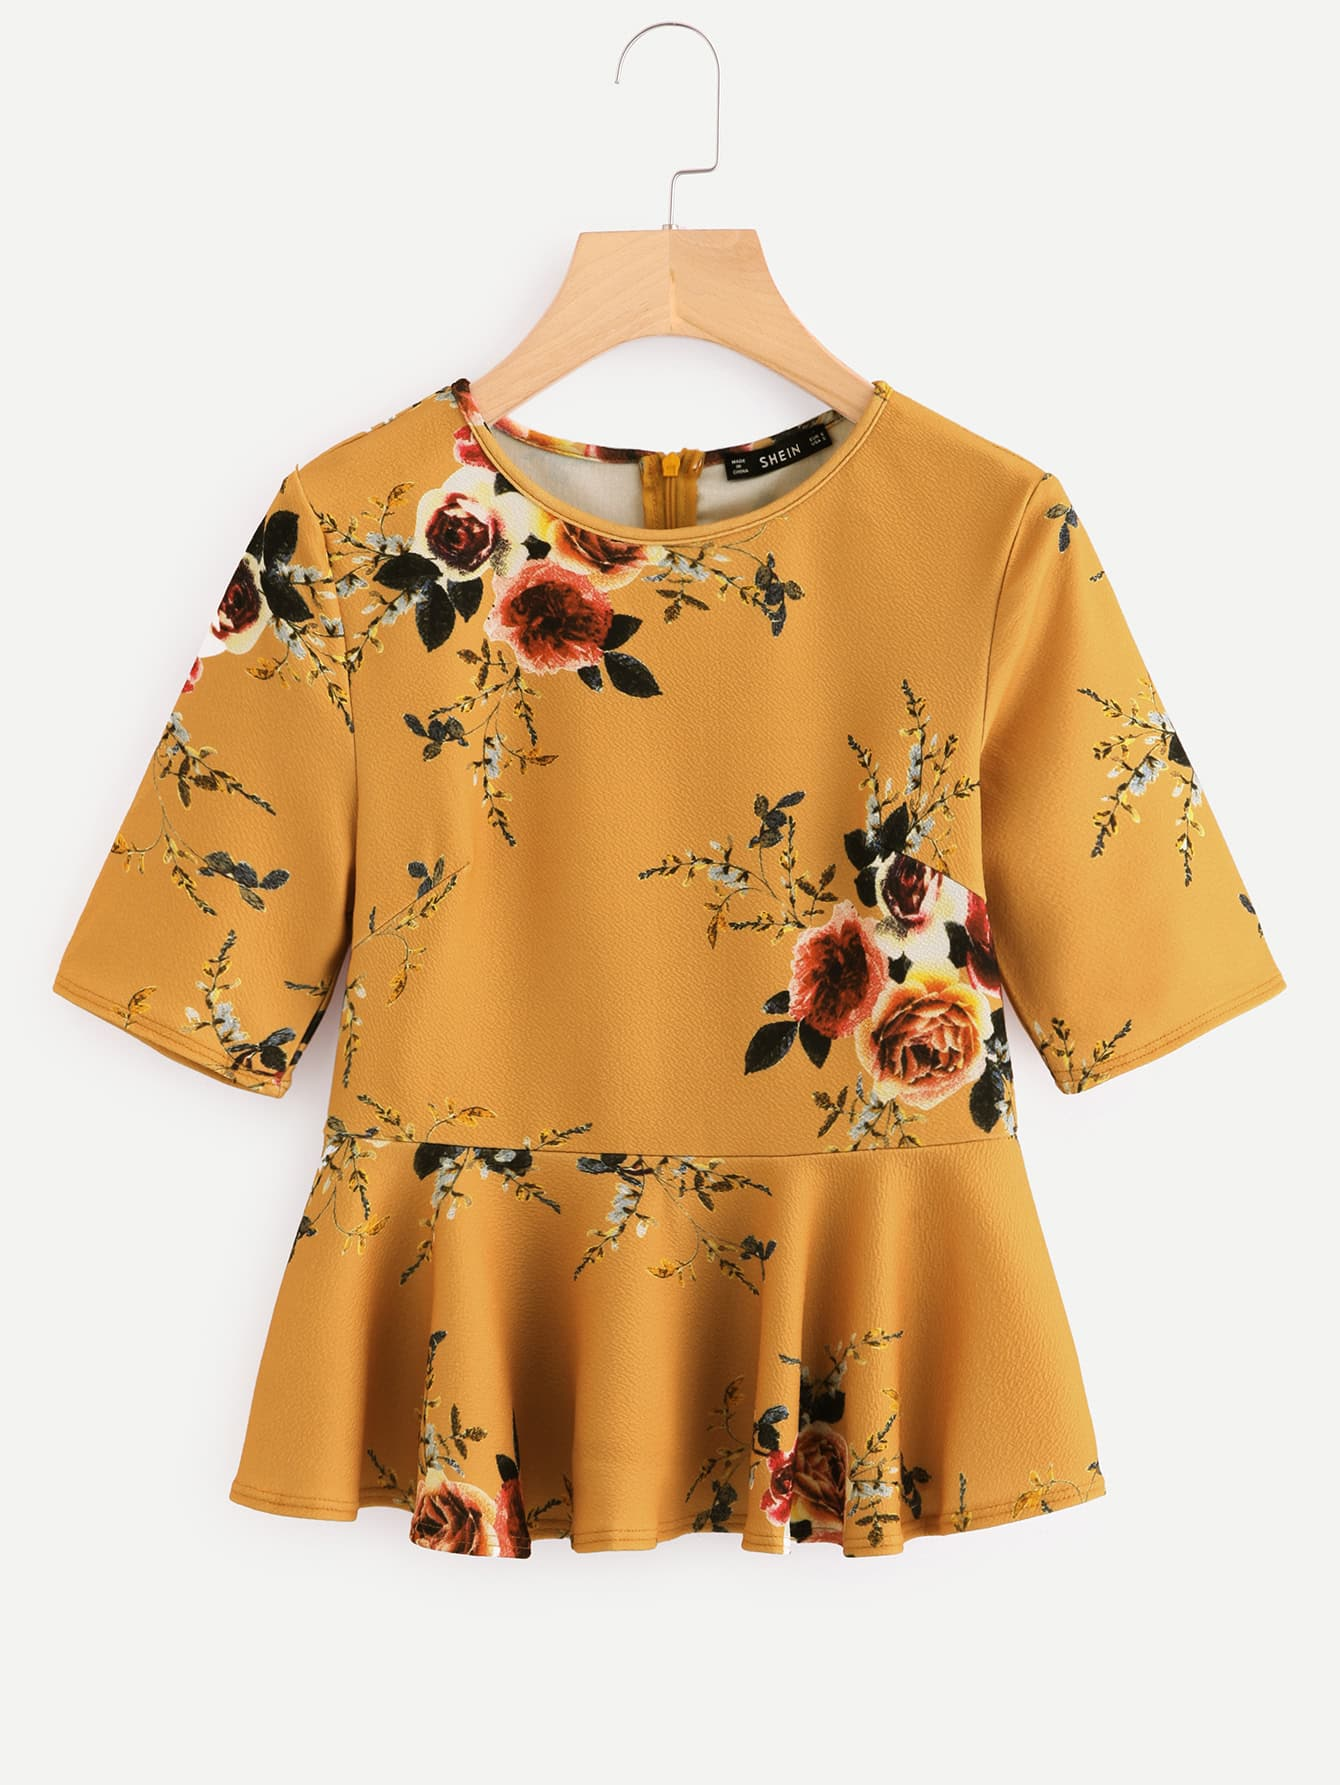 Zipper Back Ruffle Hem Peplum Top blouse171026702